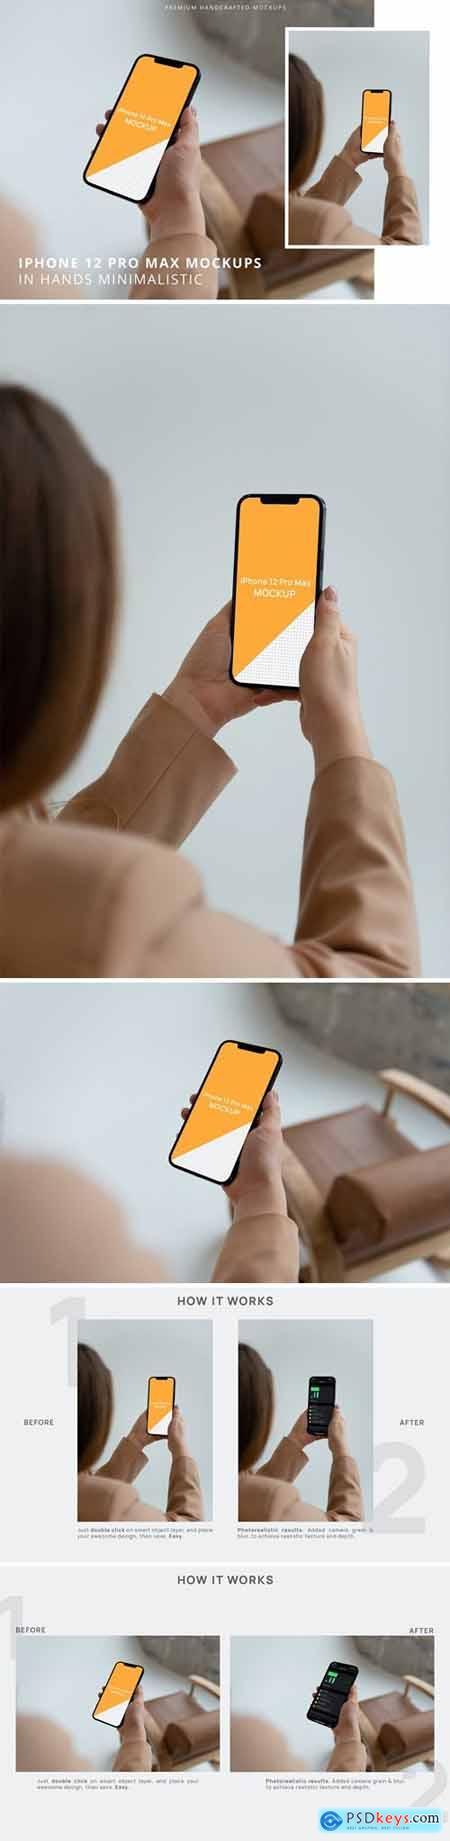 iPhone 12 Pro Max in Hands Minimalistic Mockups